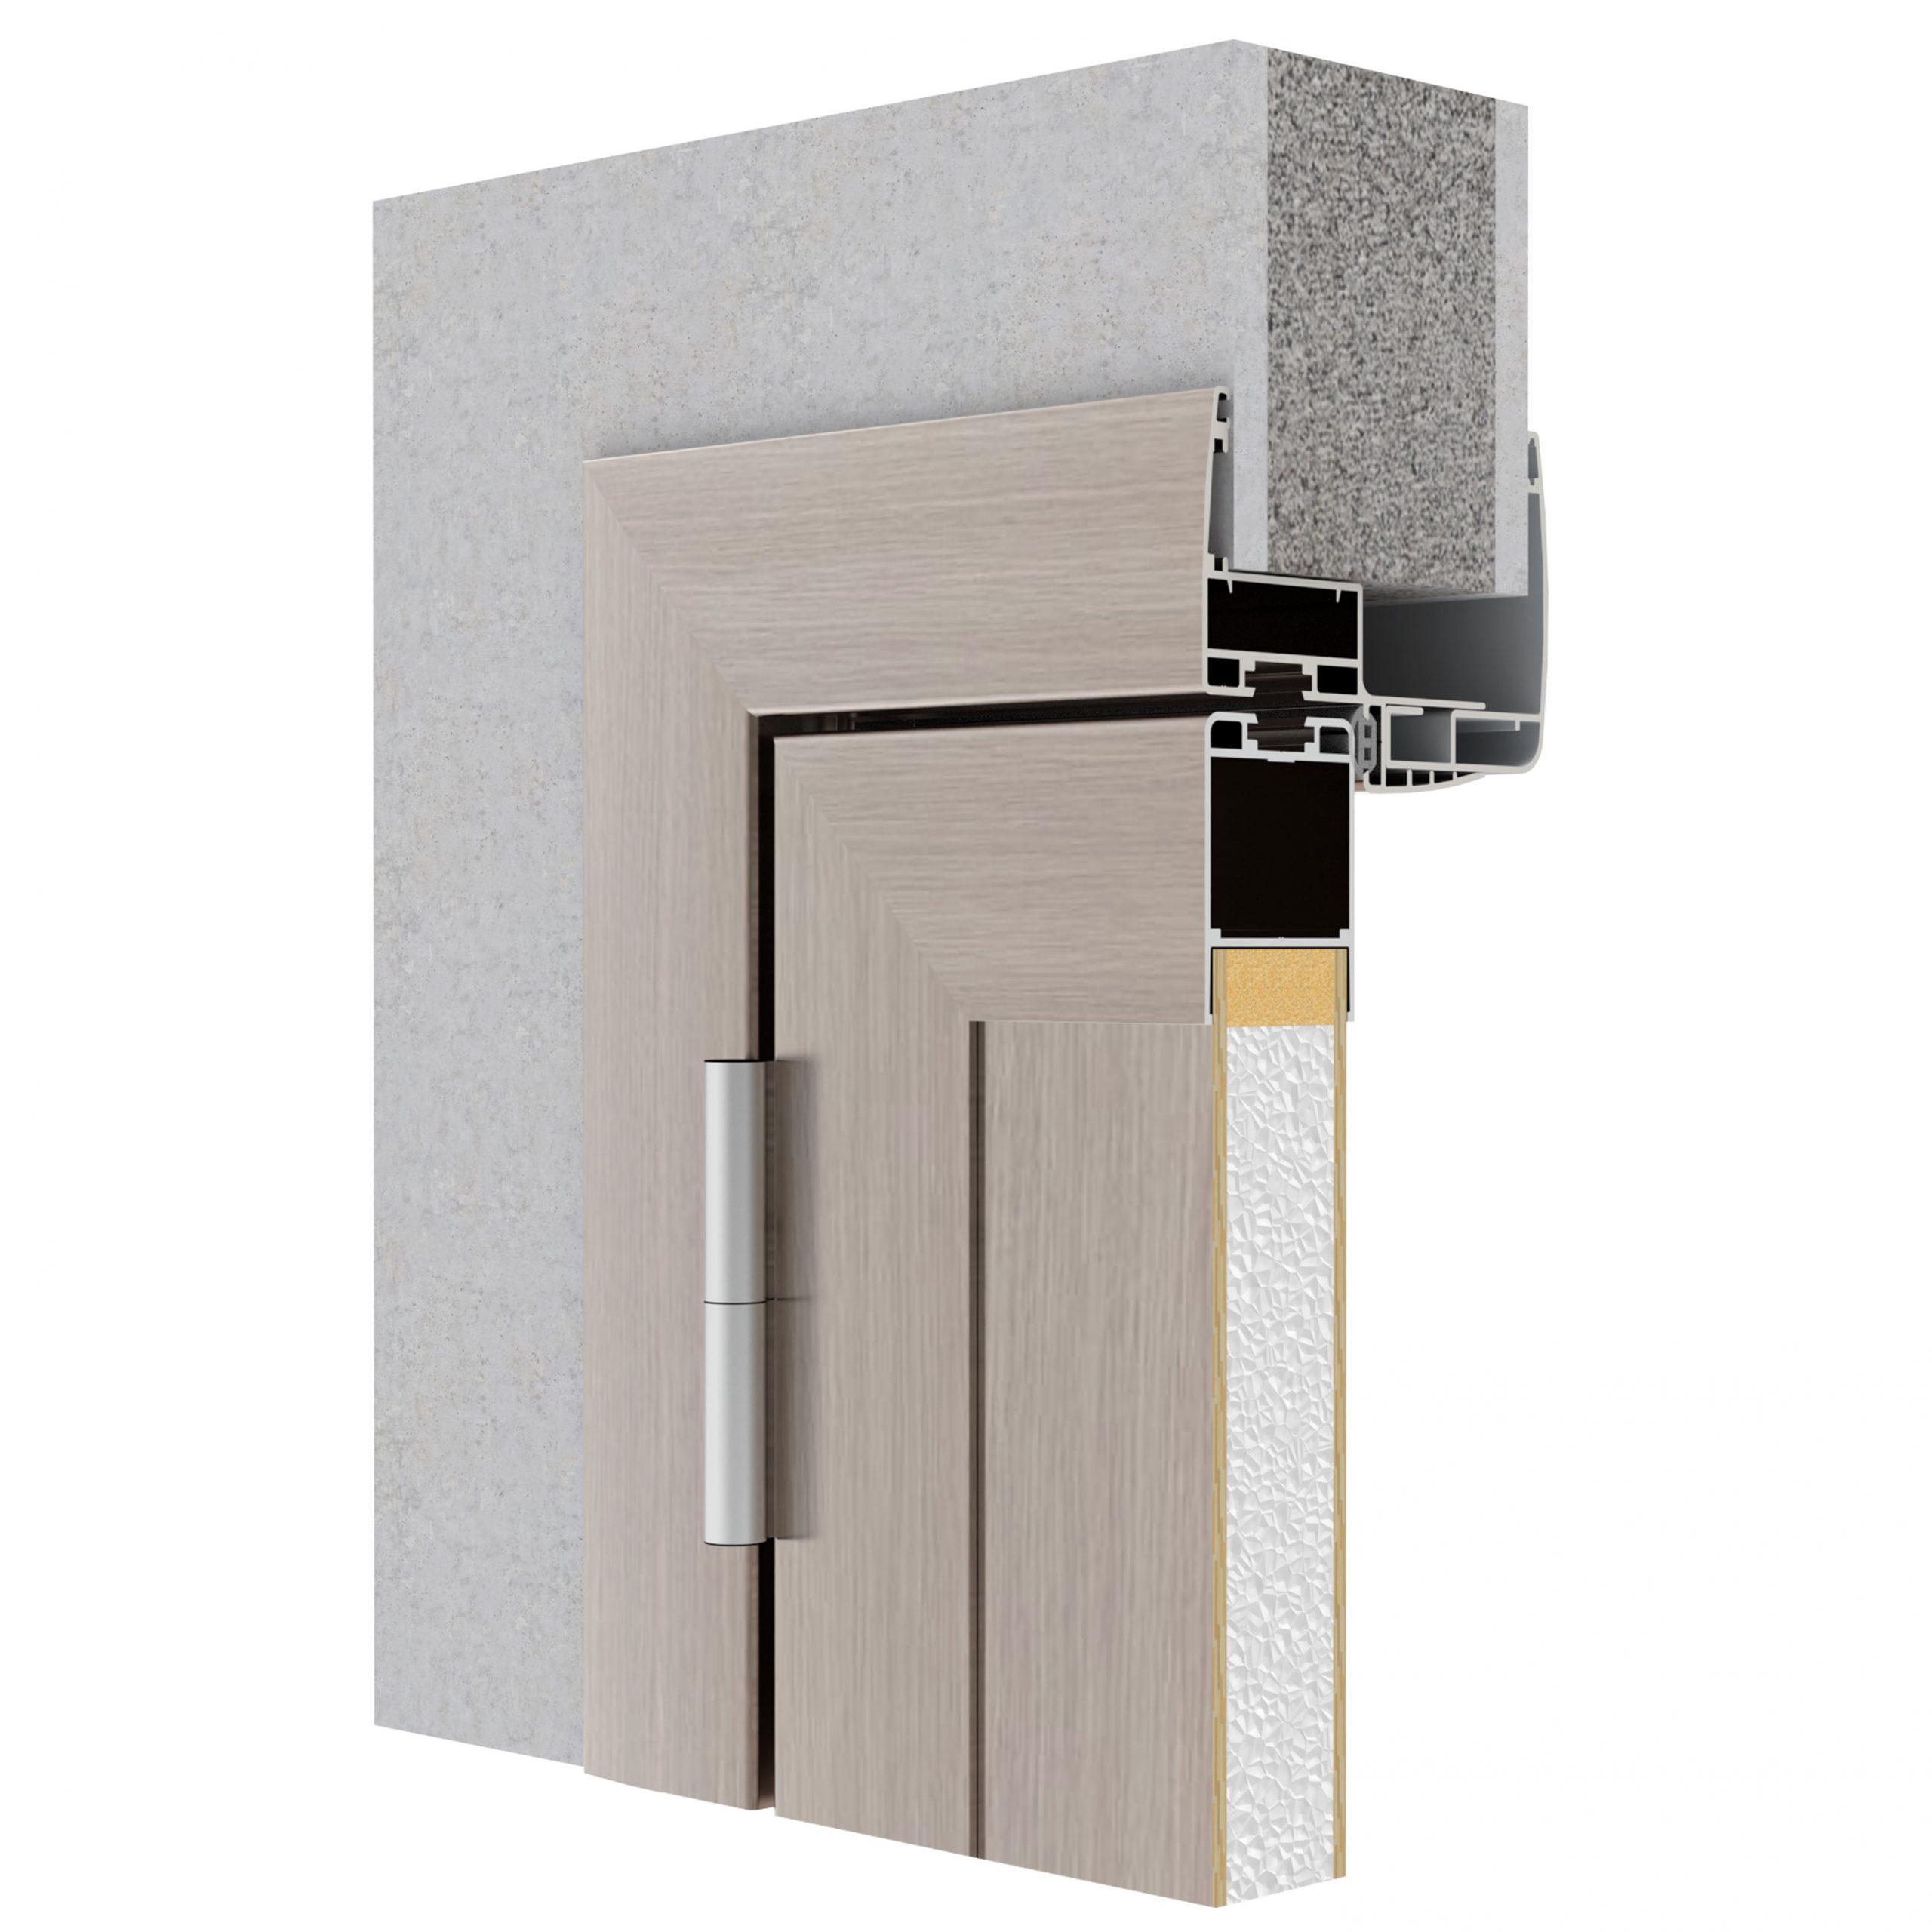 https://www.allpaint.it/wp-content/uploads/2021/07/porte-alluminio-curvo-allpaint-scaled.jpg